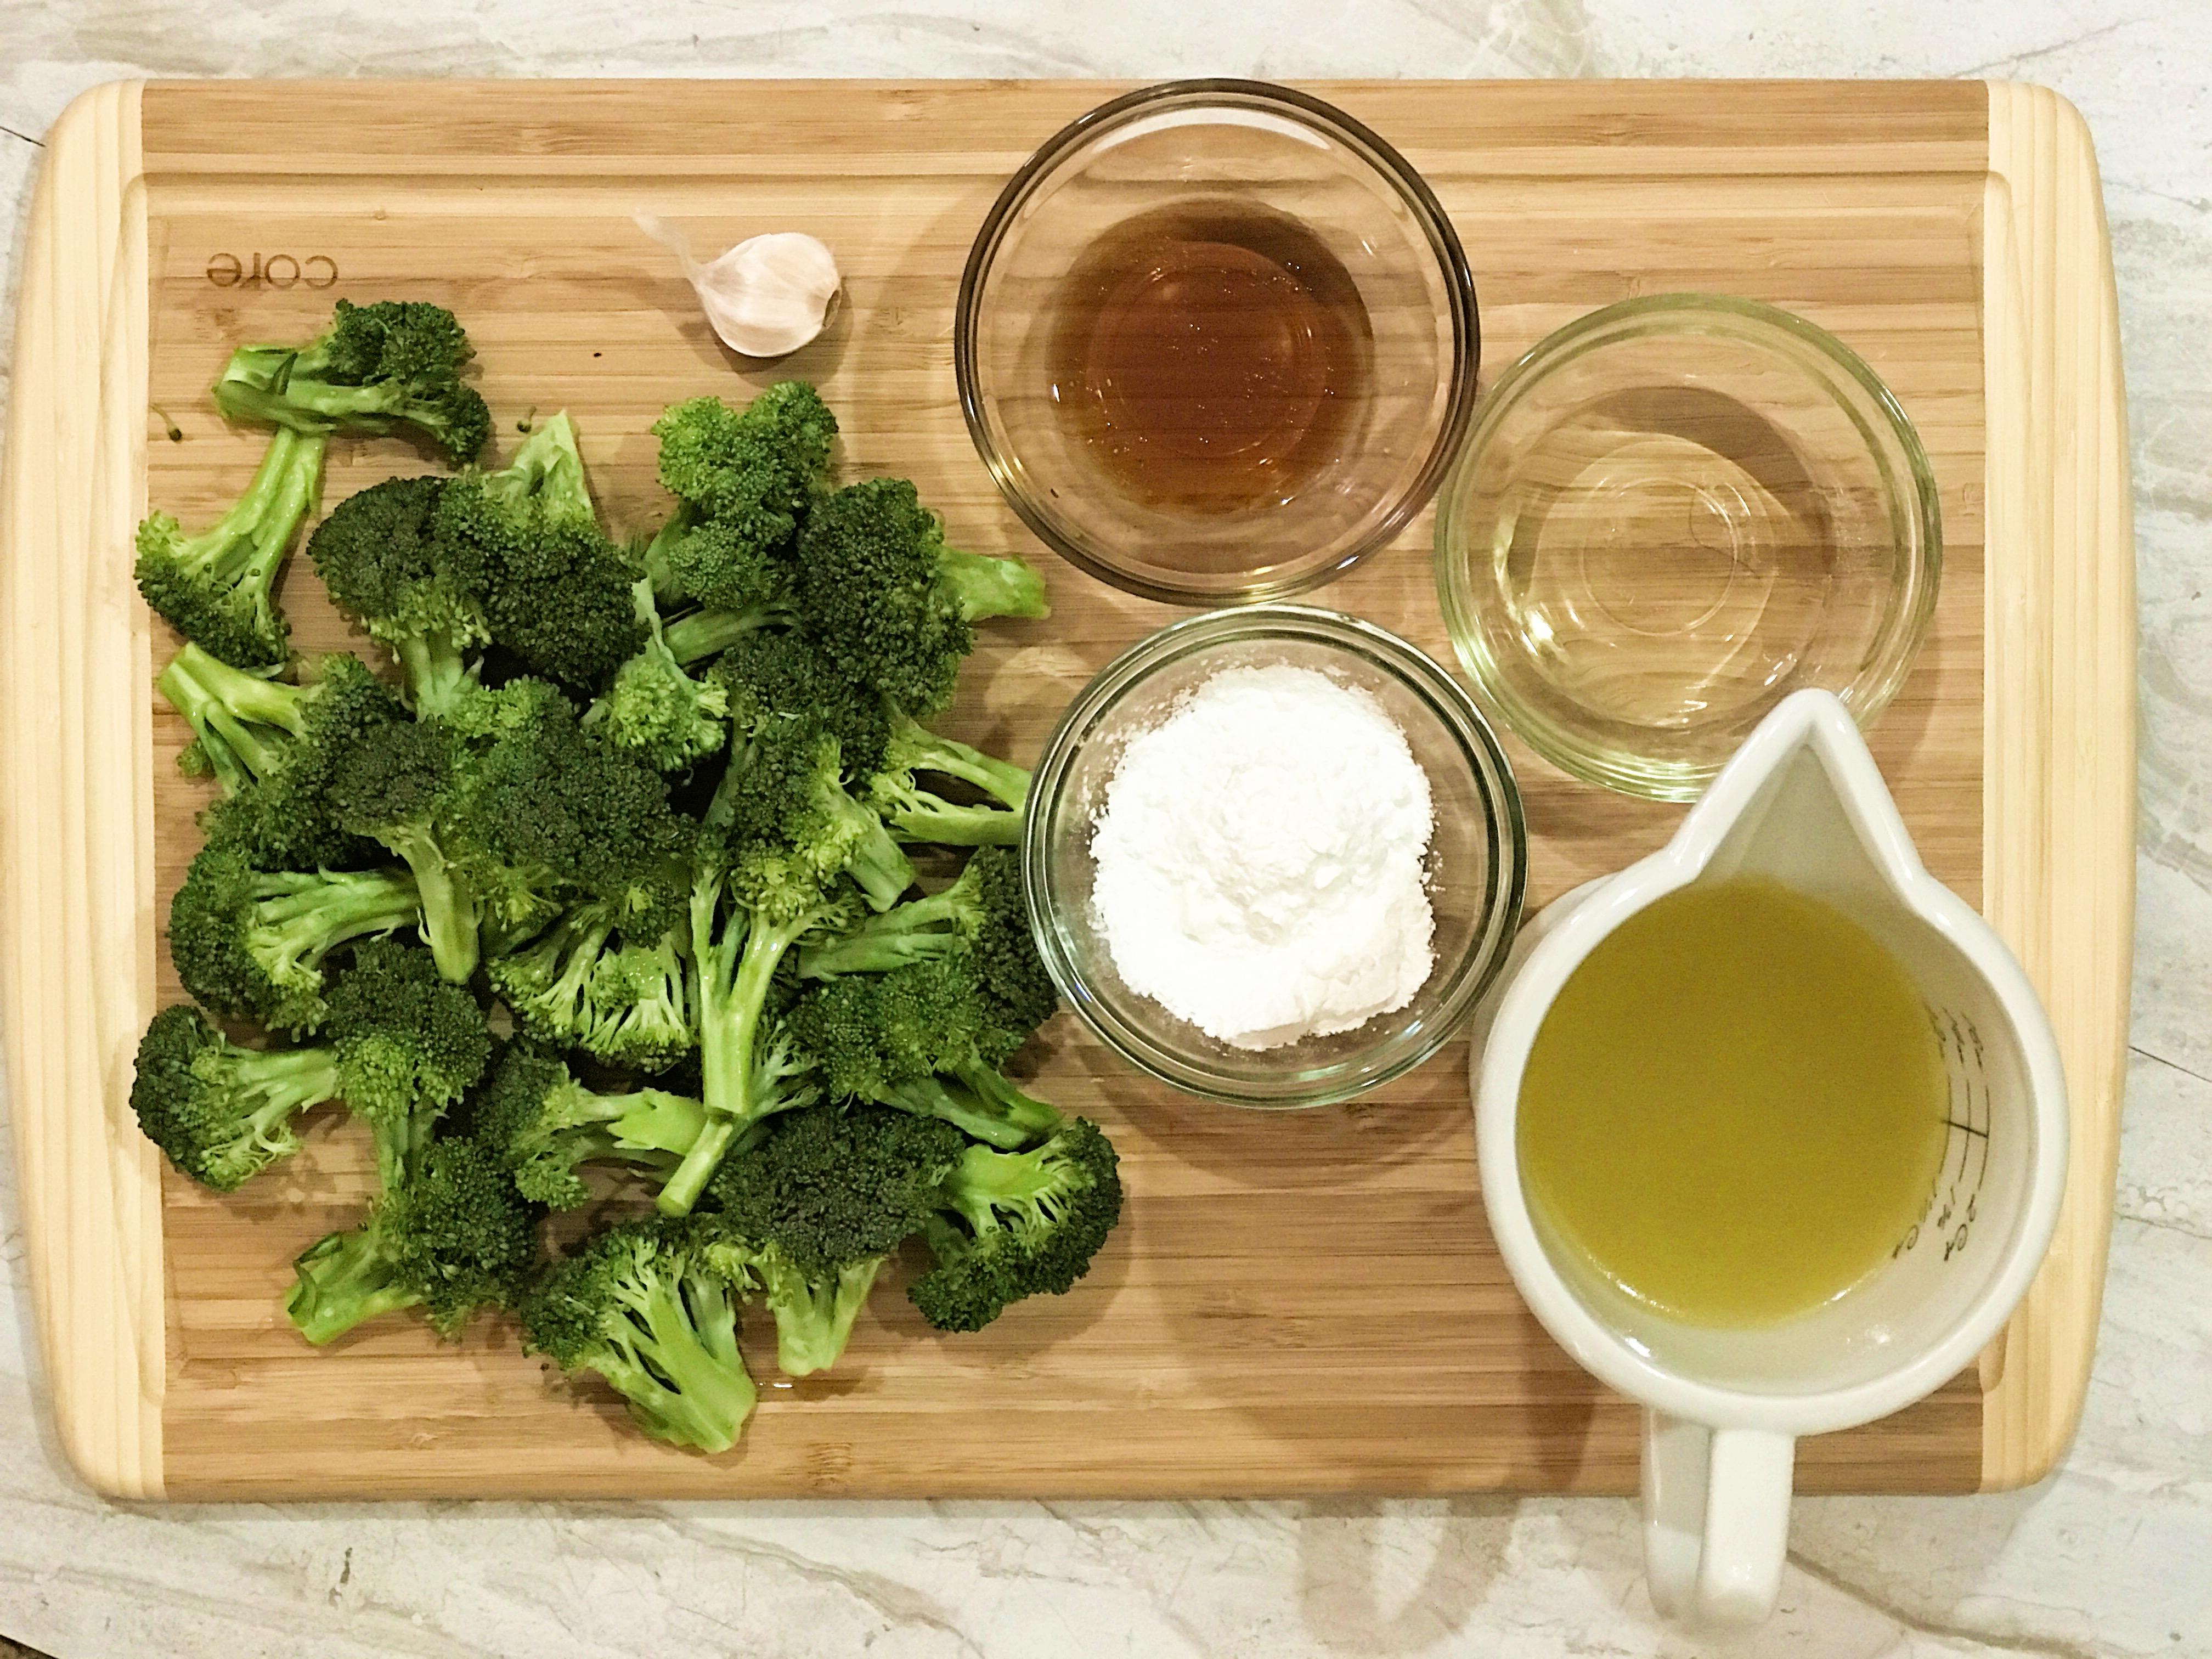 garlic broccoli stir fry ingredients